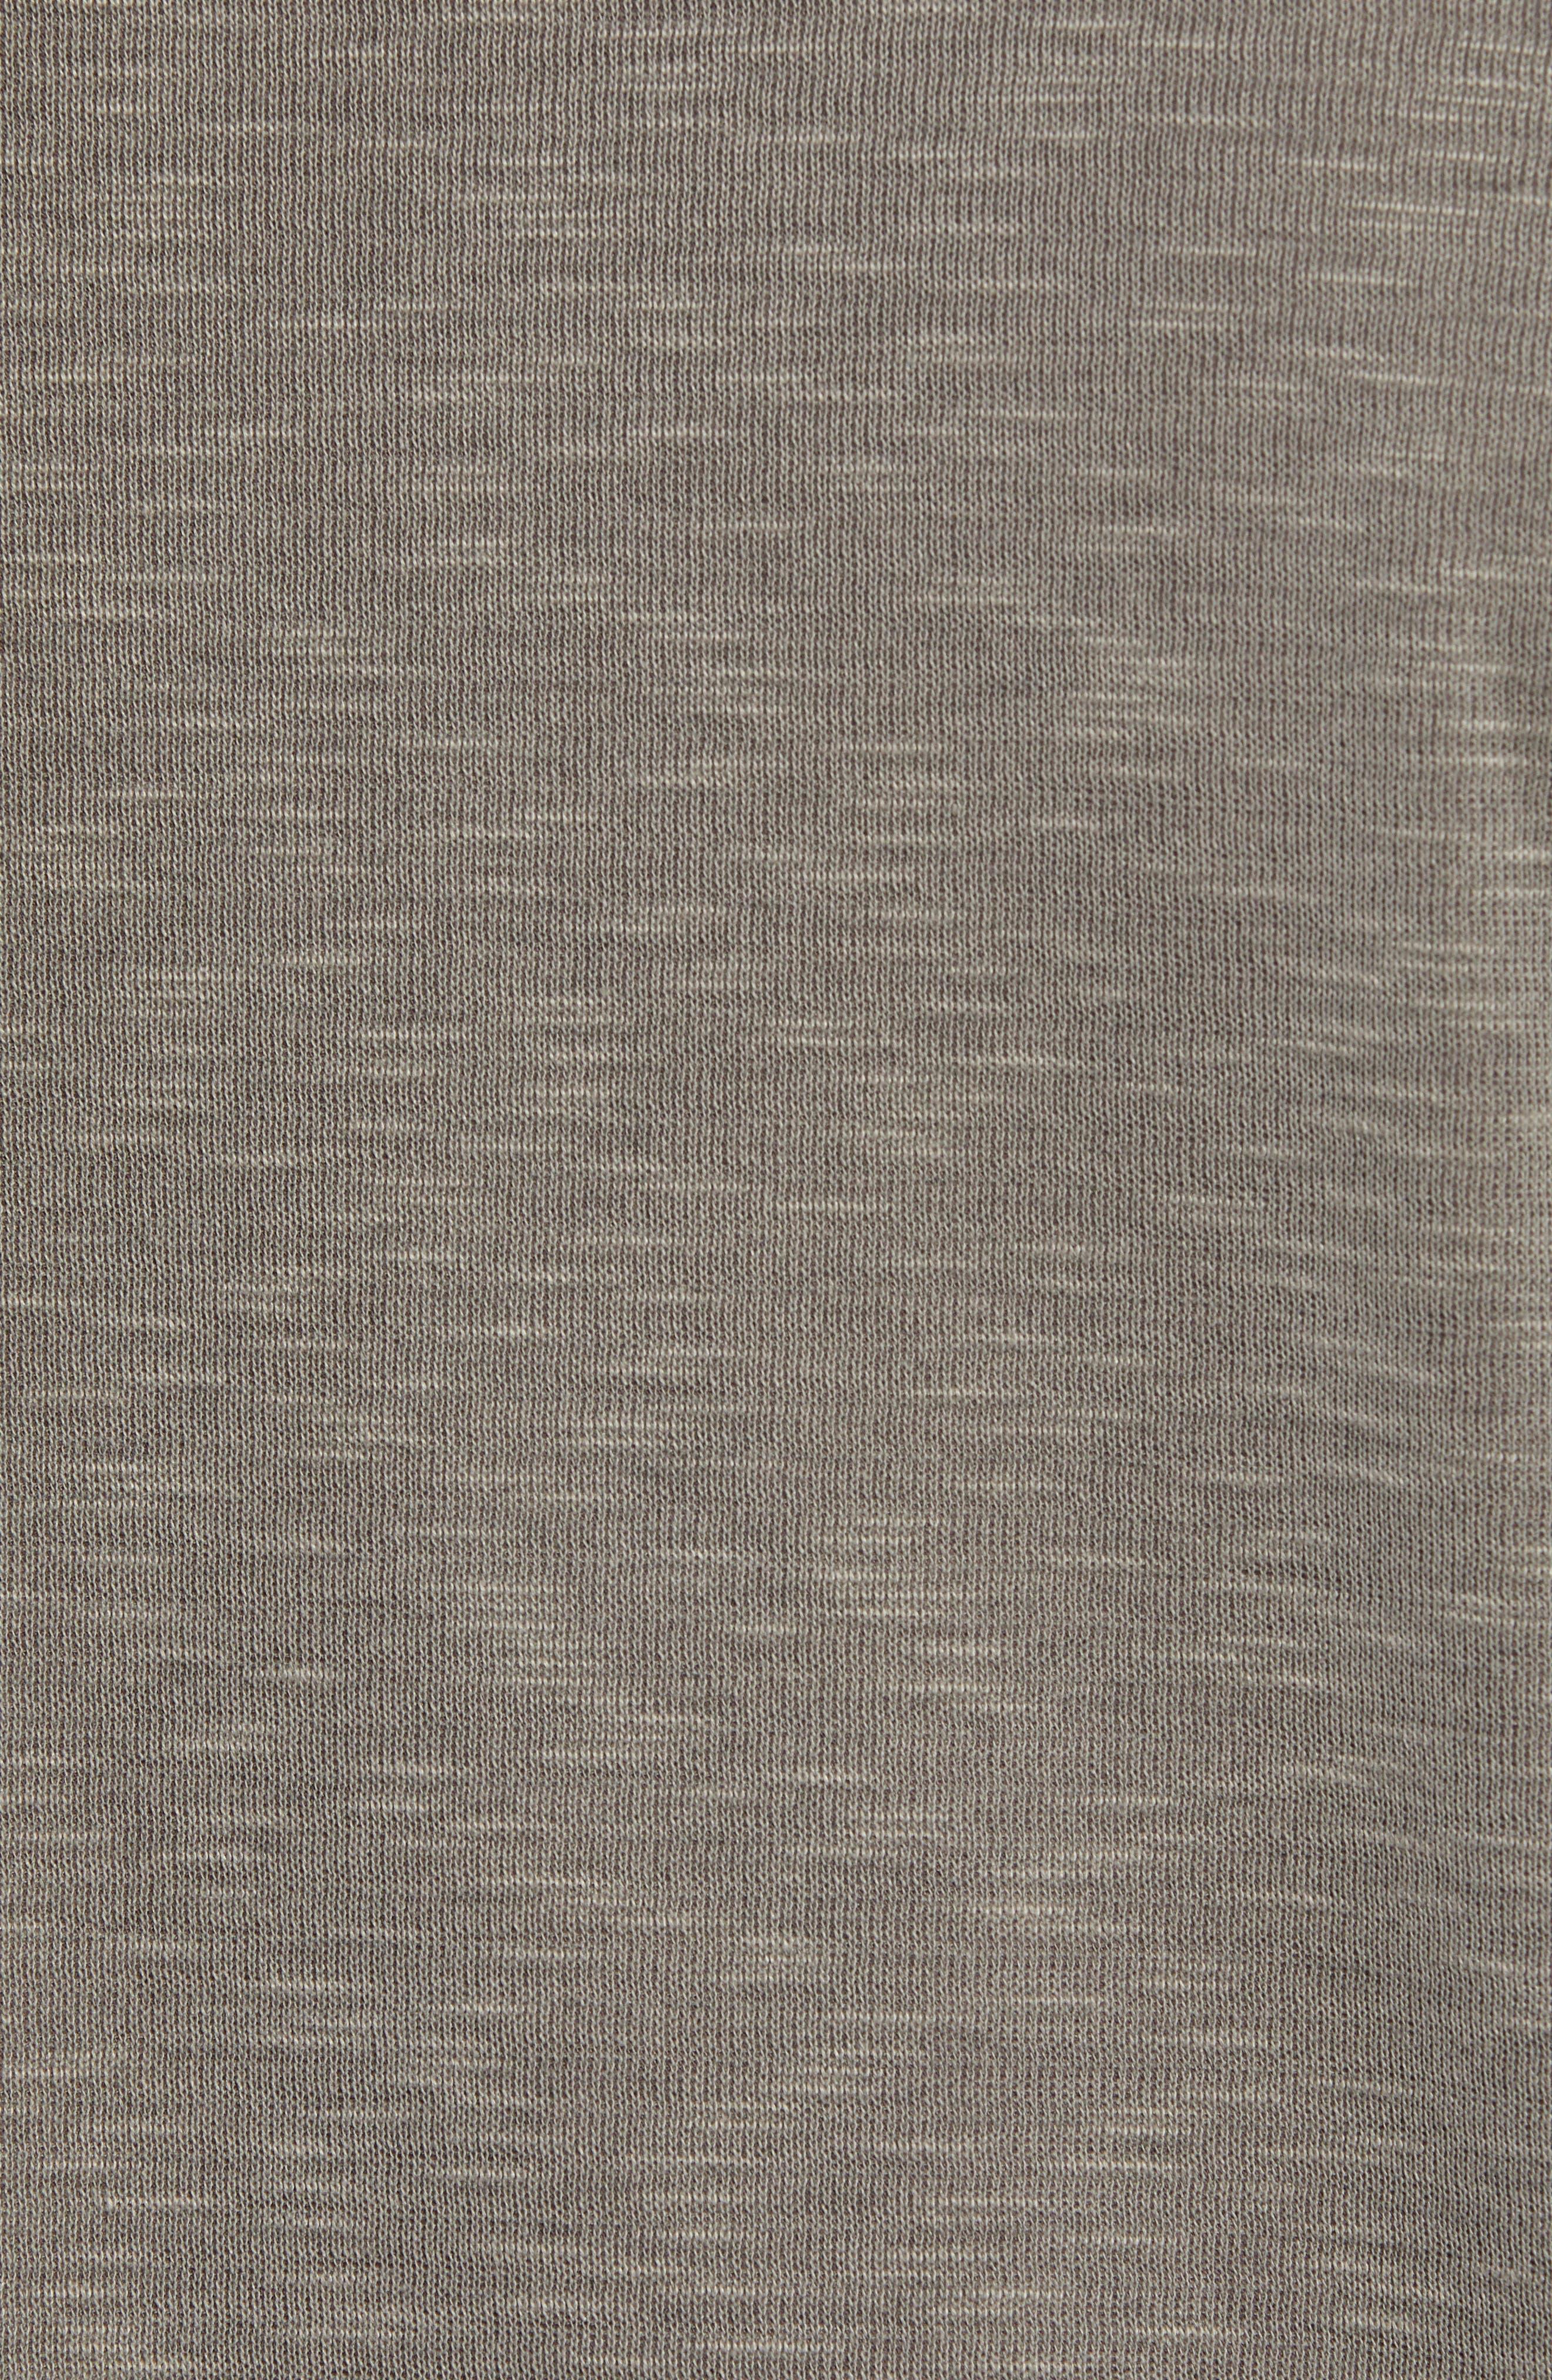 Flip Tide Standard Fit T-Shirt,                             Alternate thumbnail 6, color,                             BITTERSWEET CHOCOLATE